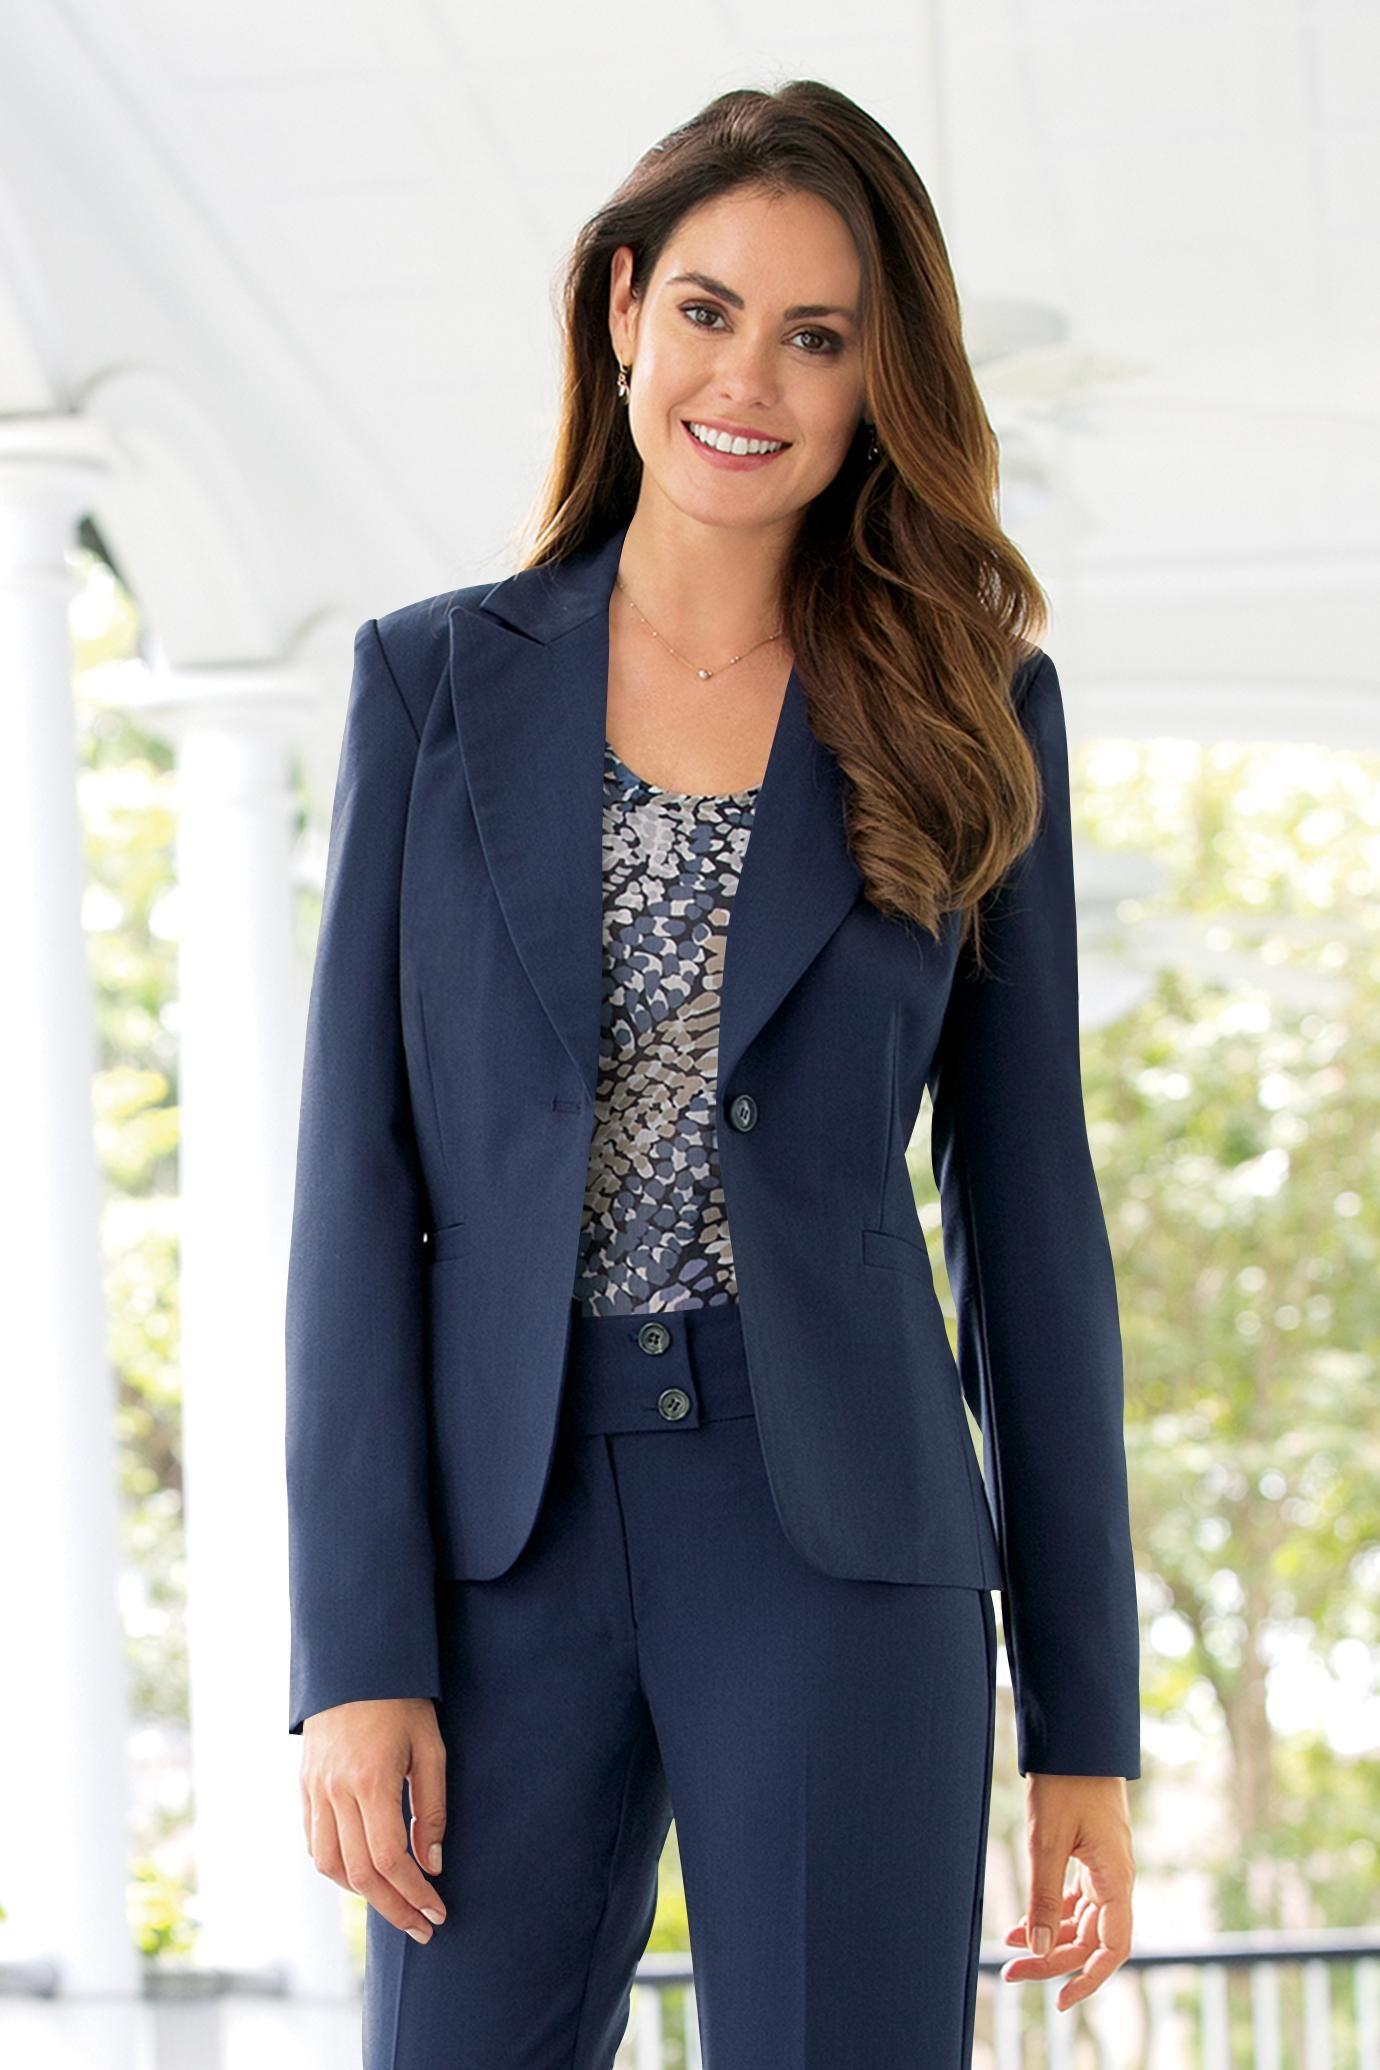 women's business fashion from chadwicks httpstwitter